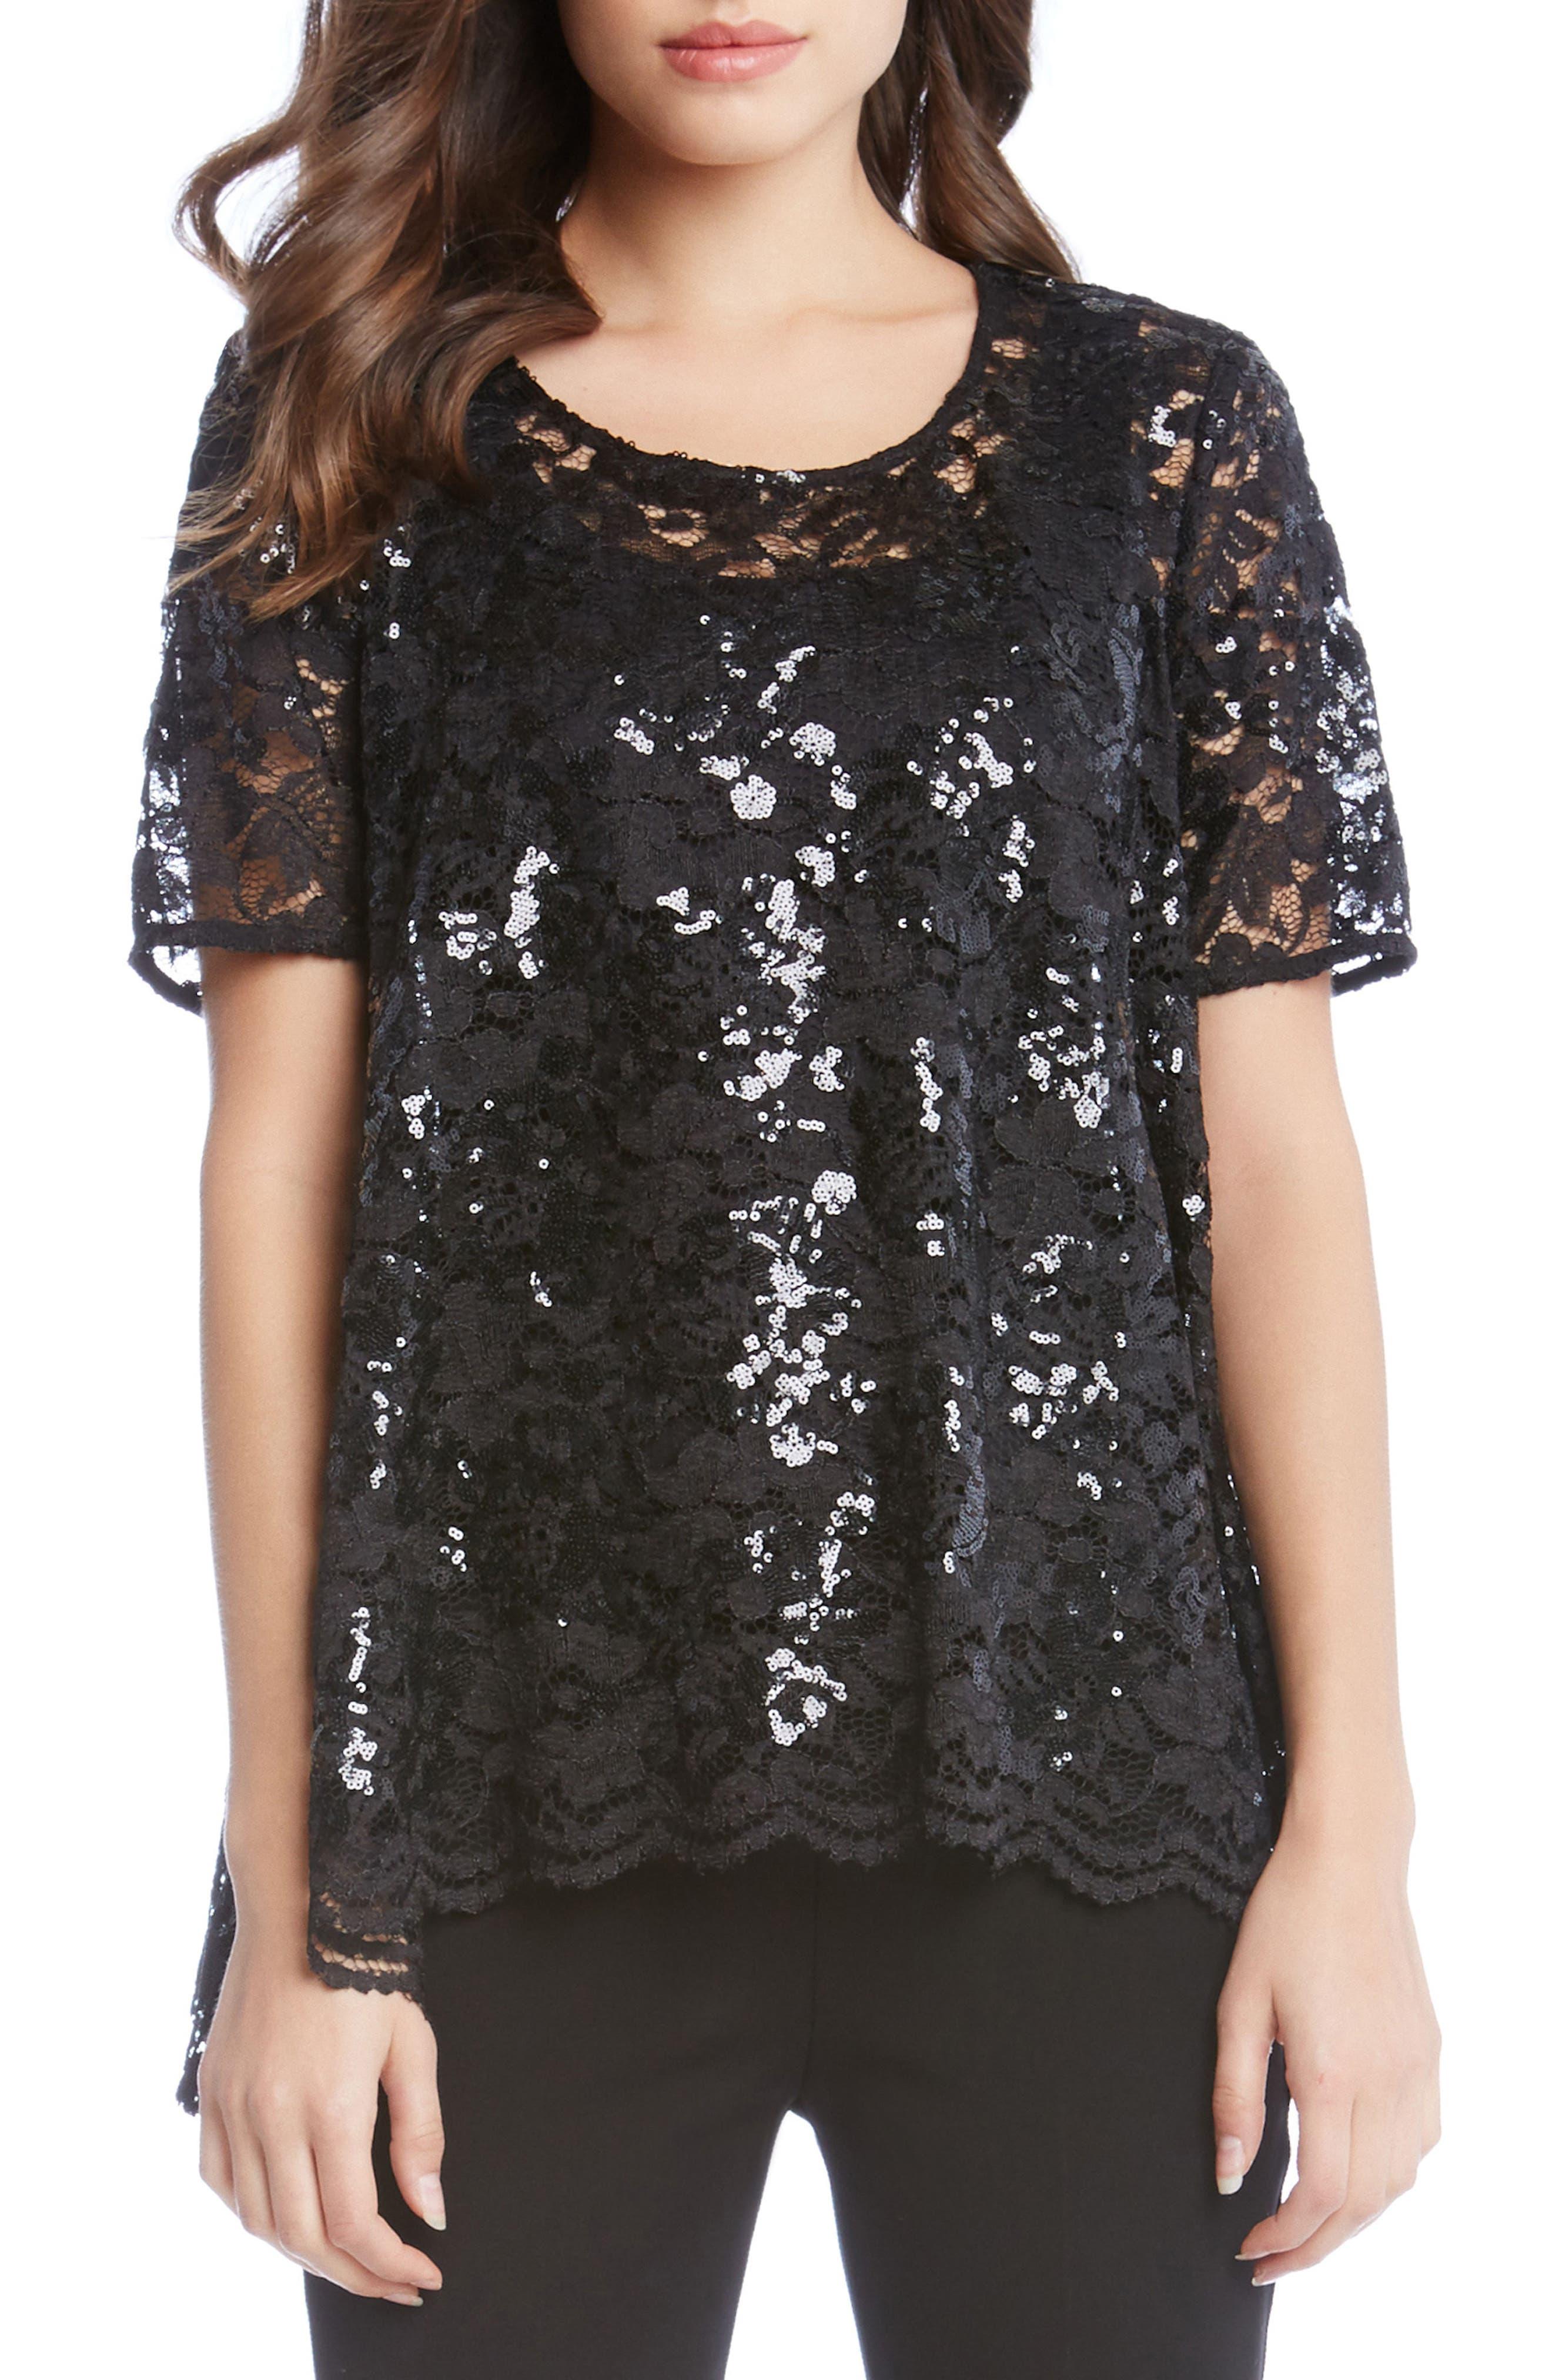 Alternate Image 1 Selected - Karen Kane Sequin Lace Flare Top